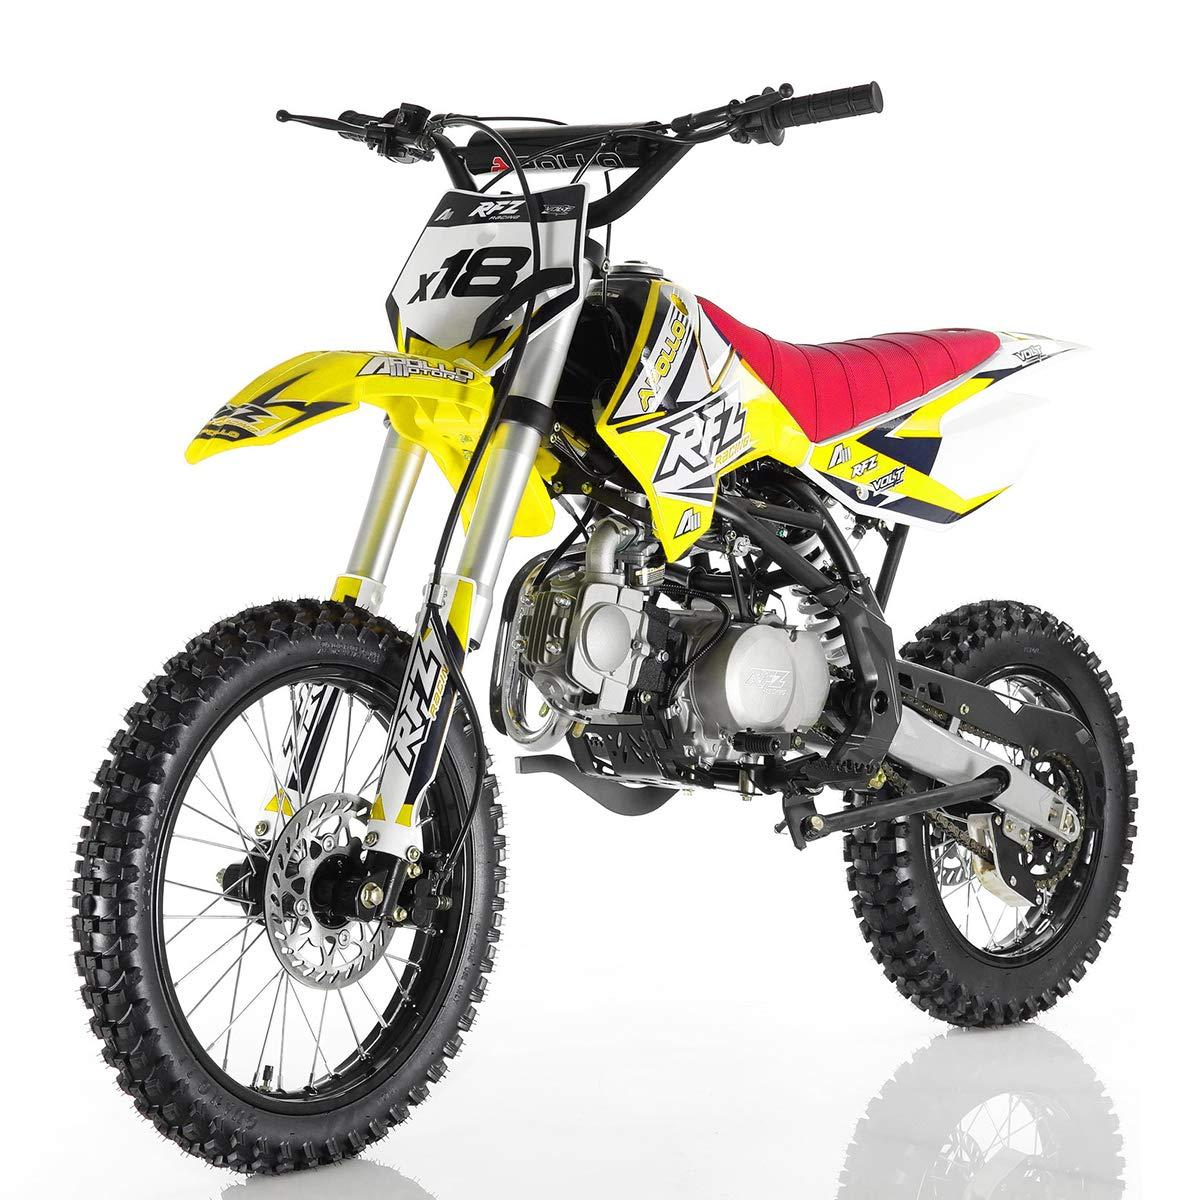 Amazon.com: 125cc Dirt Bike Pit Bike Adults Dirtbikes ...